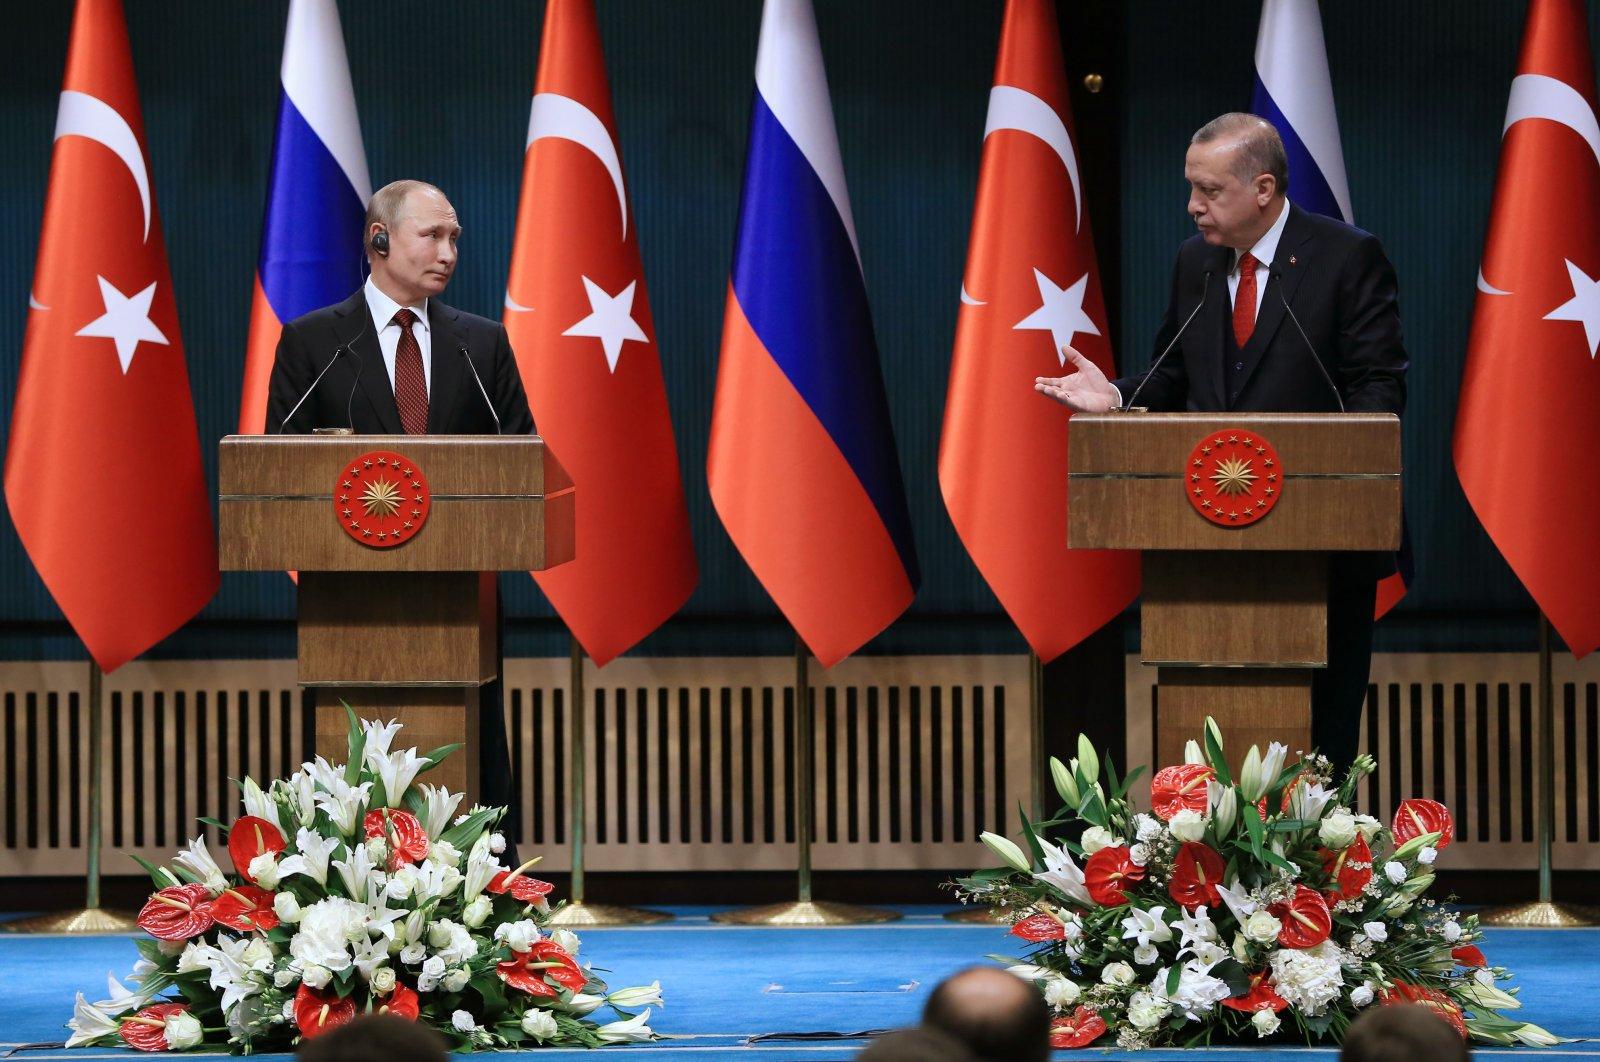 Erdoğan, Putin discuss Nagorno-Karabakh, Syria, Libya in phone call